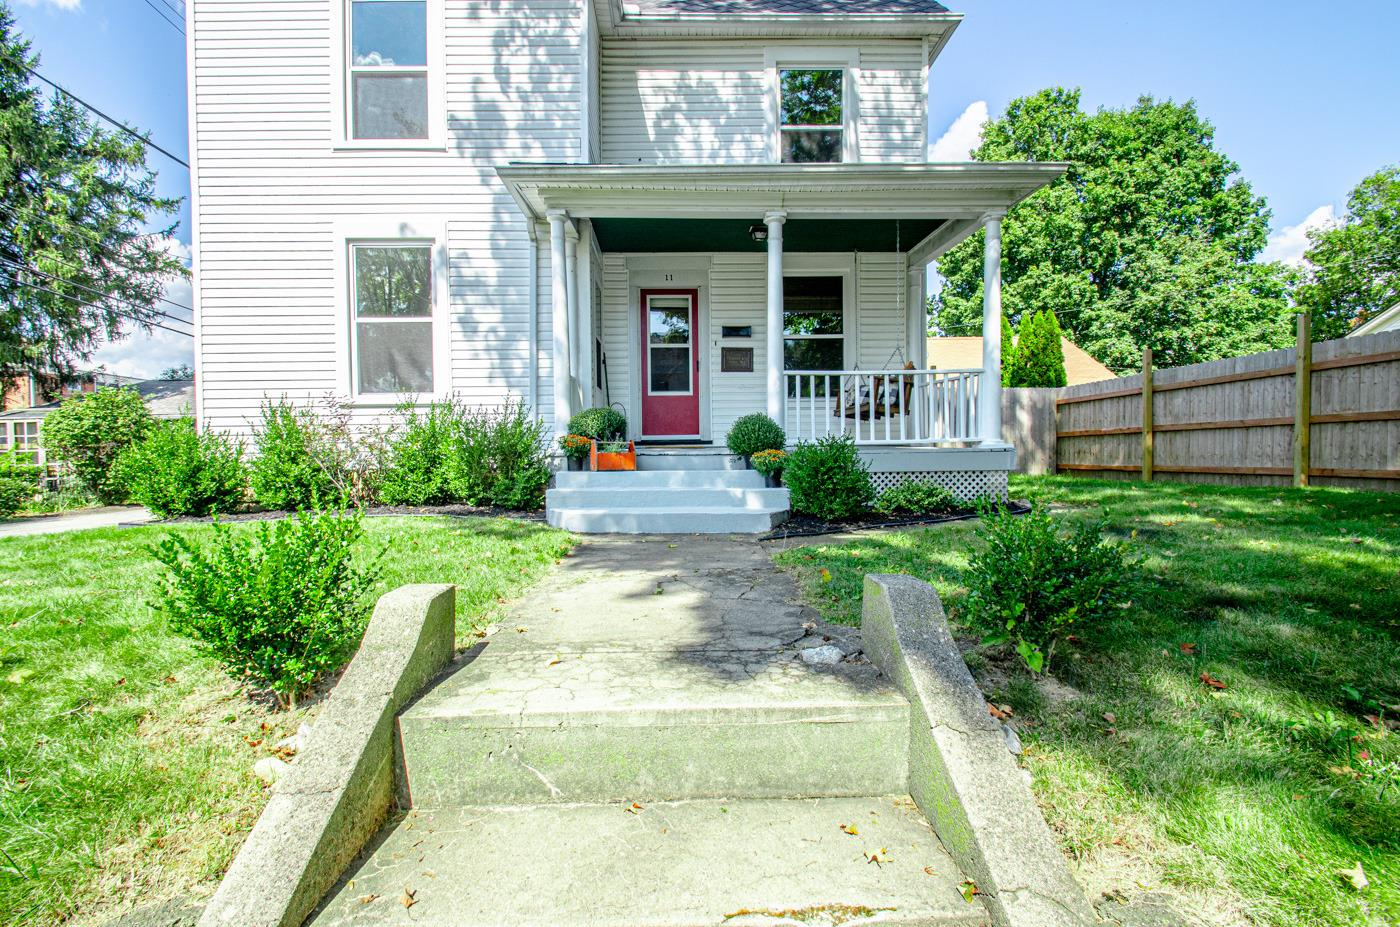 Photo 2 for 11 E Oak Street Preble County, OH 45381